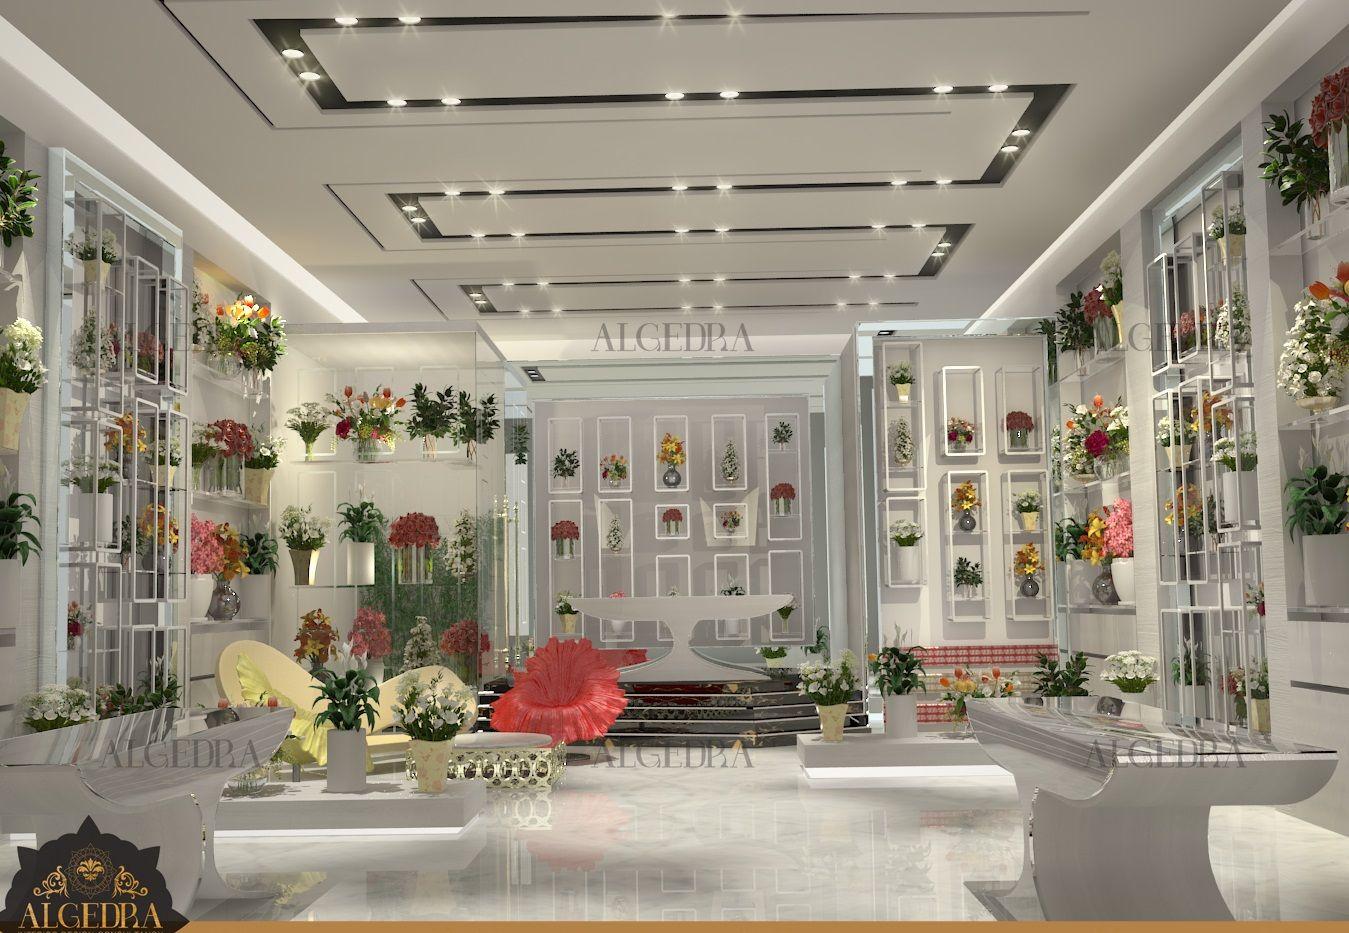 Flower Shop Interior Design Ideasart4searchcom art4searchcom